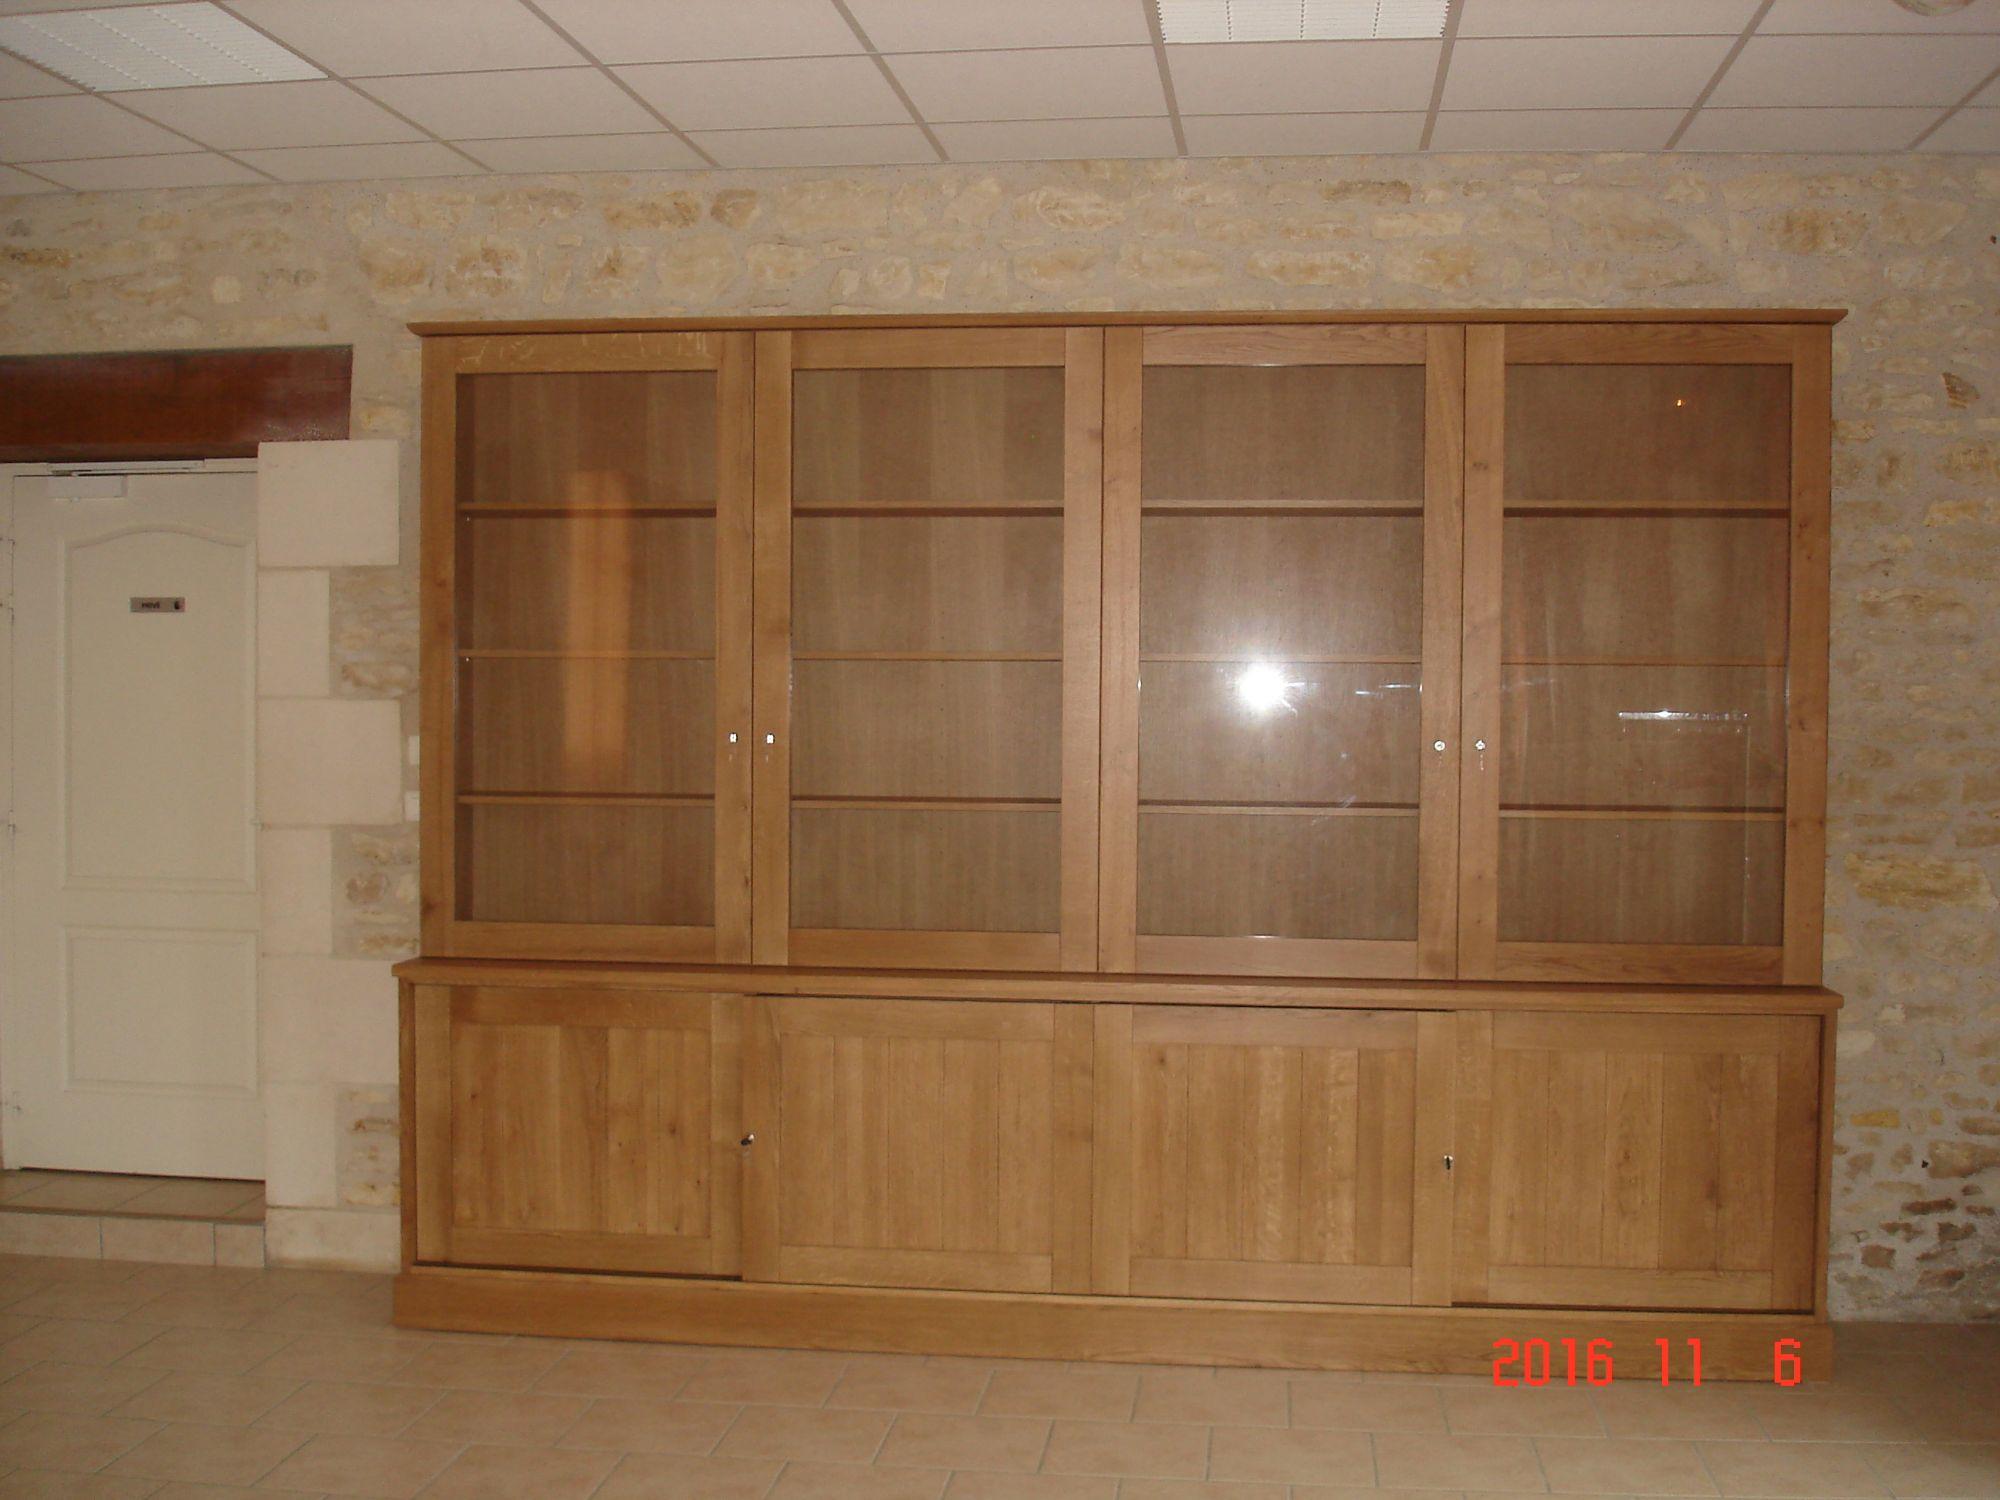 fabrication de meubles mbl 86 menuiserie amberre 86. Black Bedroom Furniture Sets. Home Design Ideas